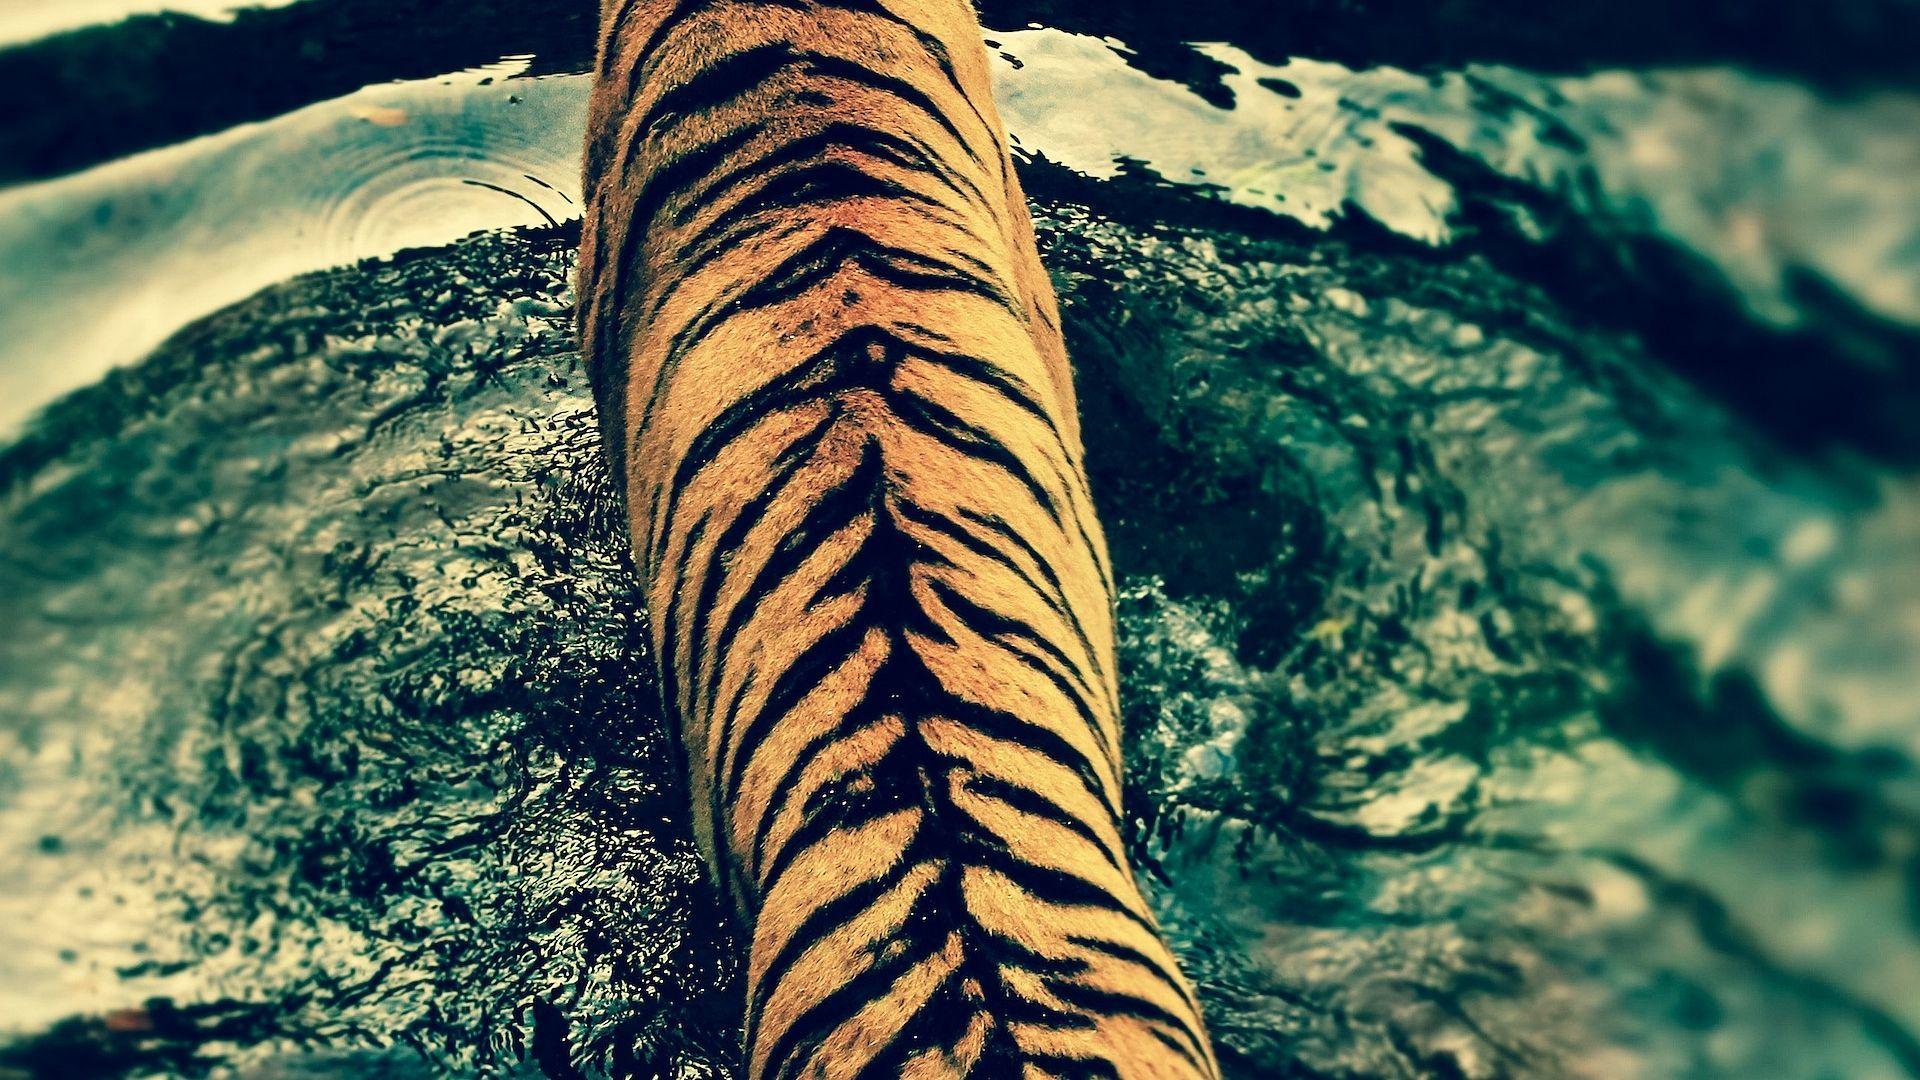 HDR Tiger Walking on Water